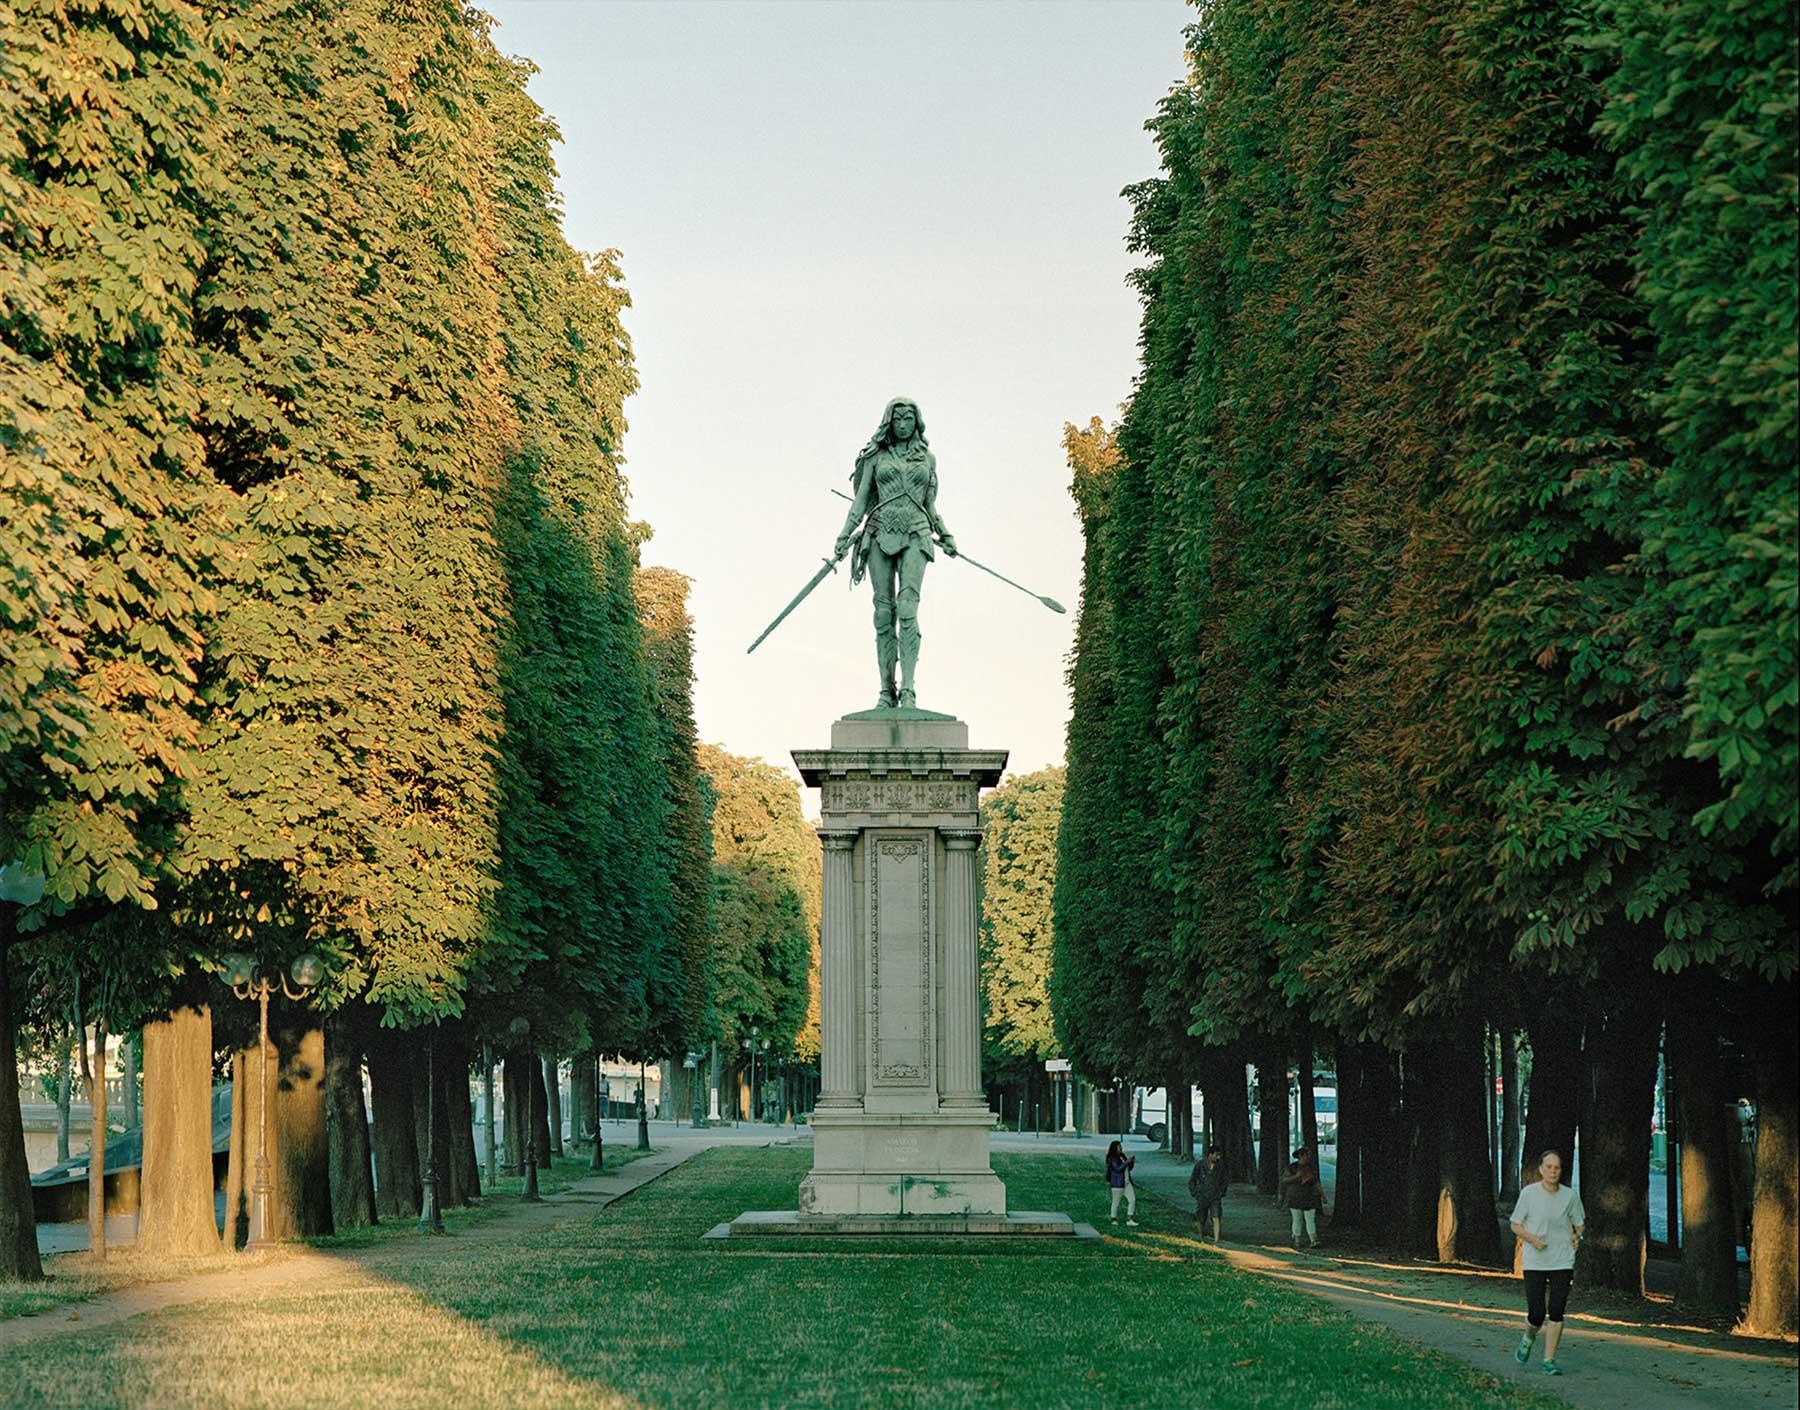 Popkulturen-Statuen Monuments_Benoit-Lapray_07